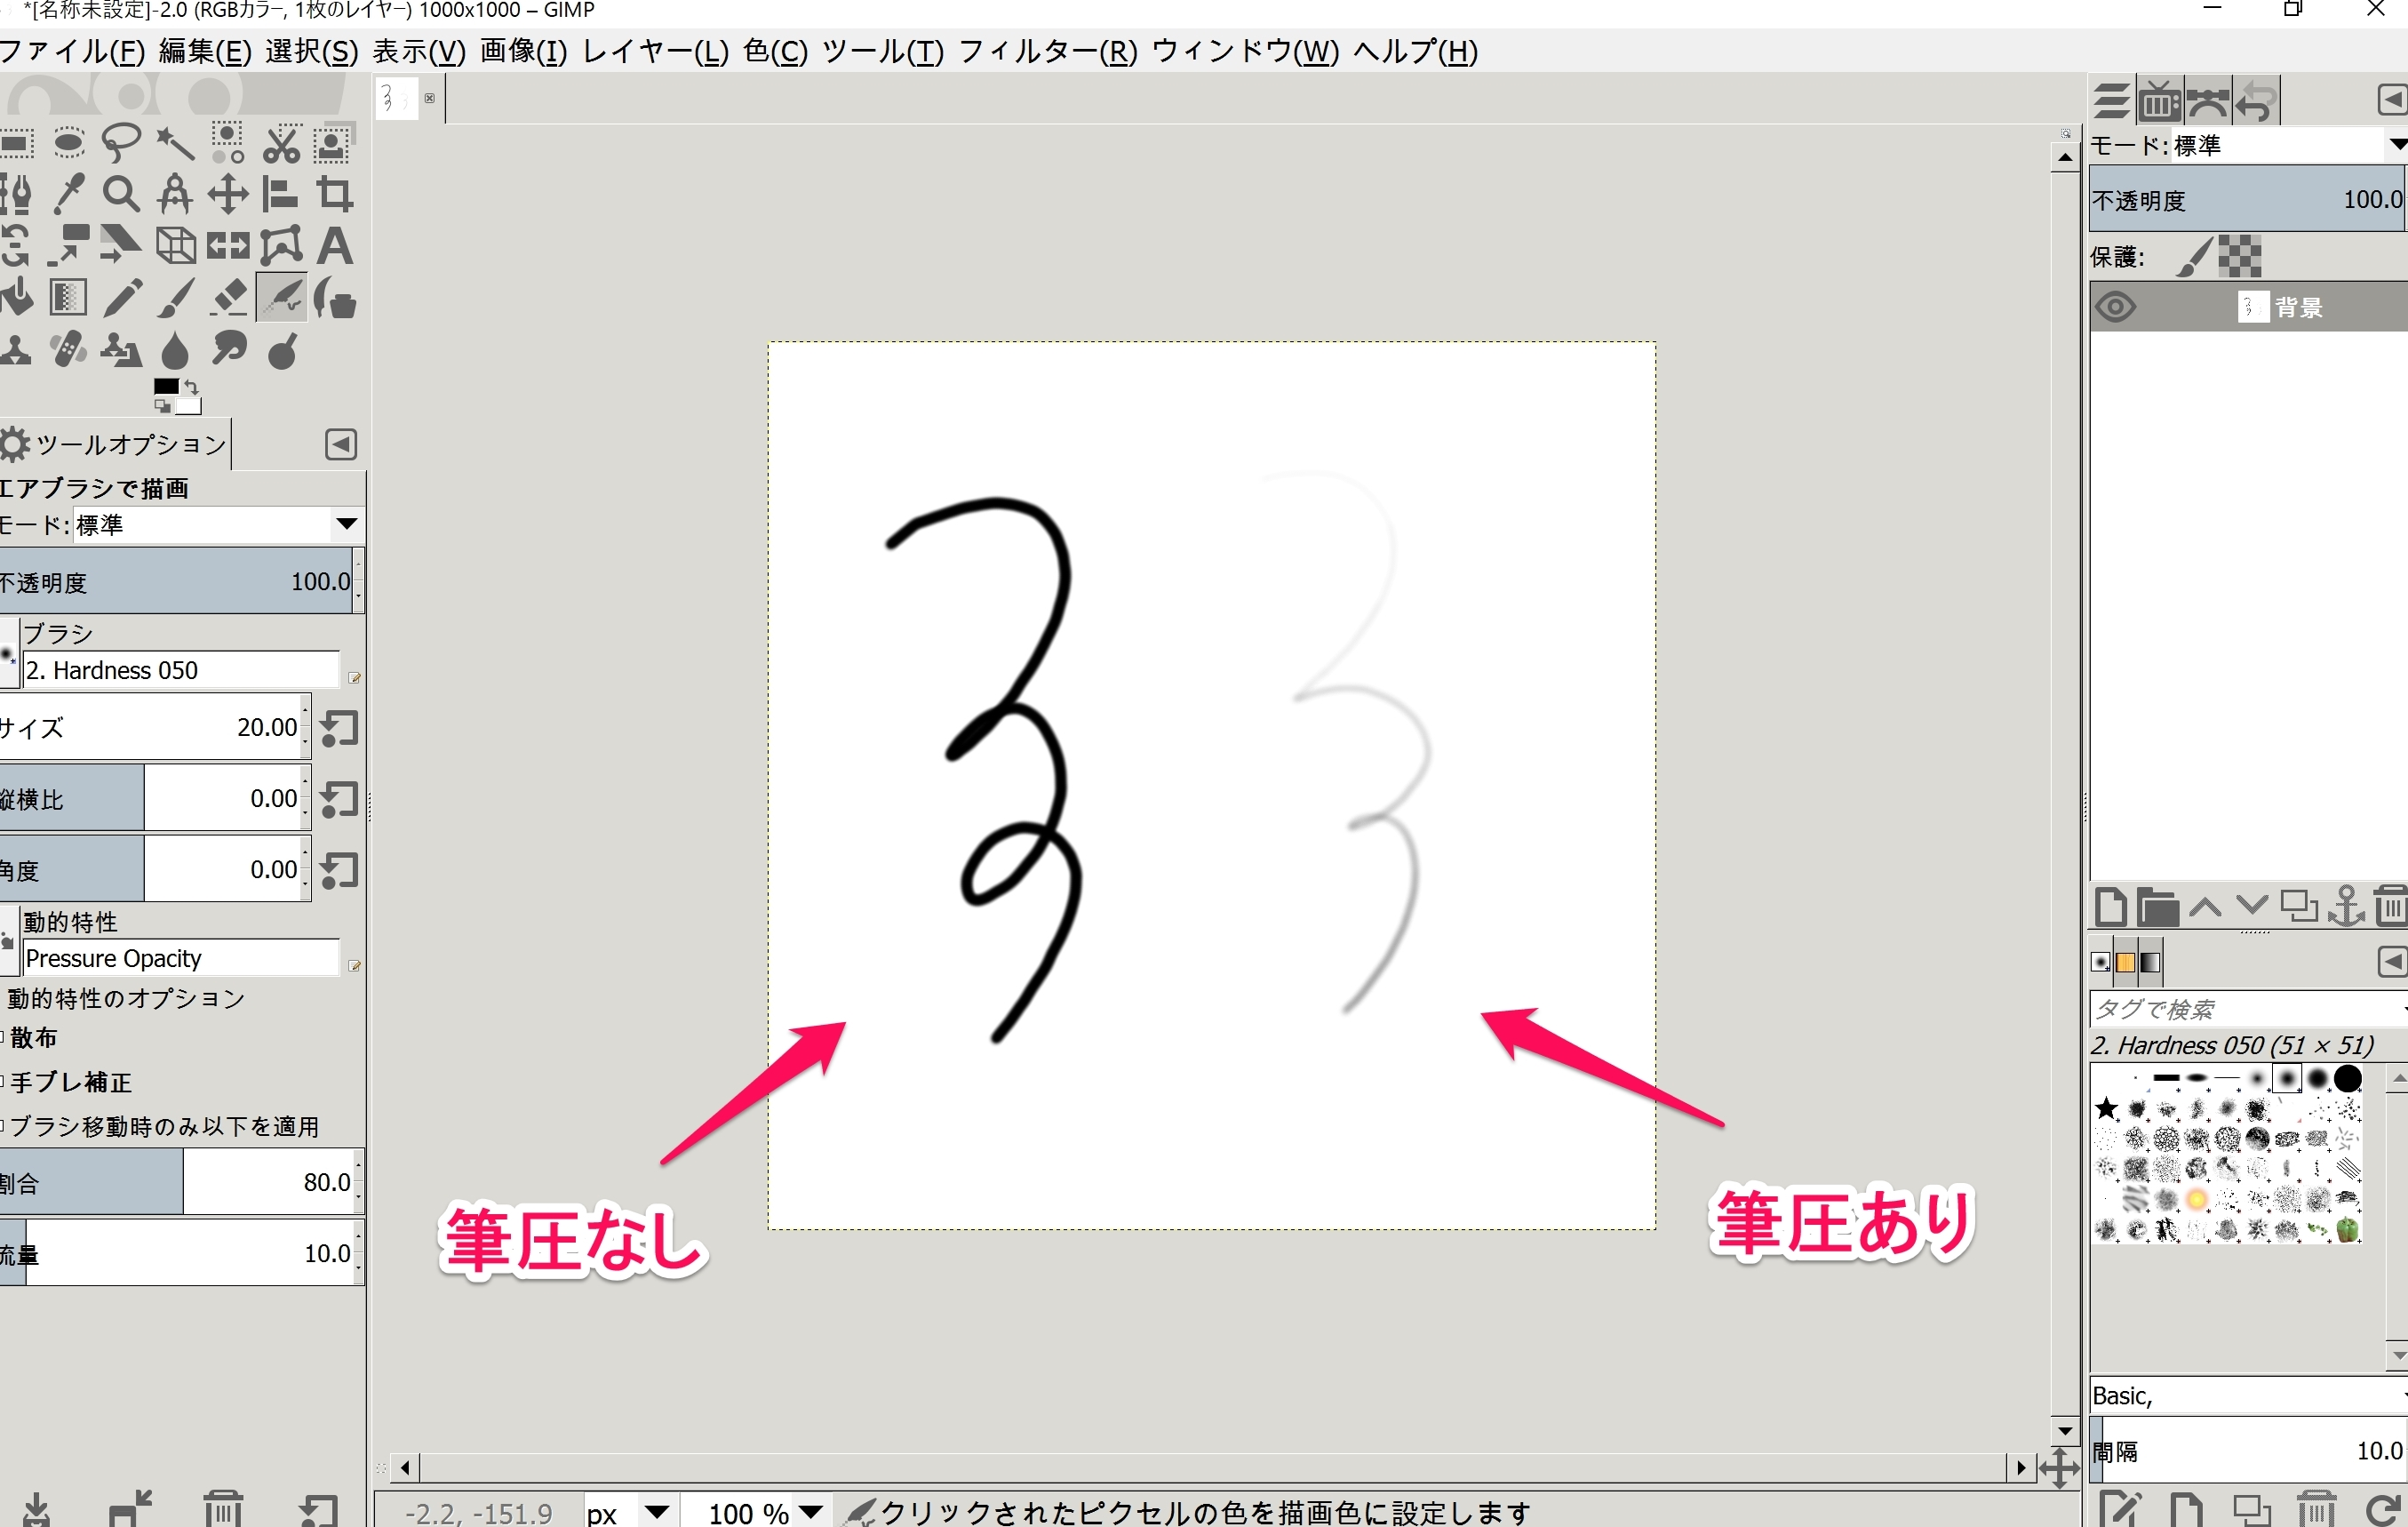 Surface Pro 4 GIMP 筆圧